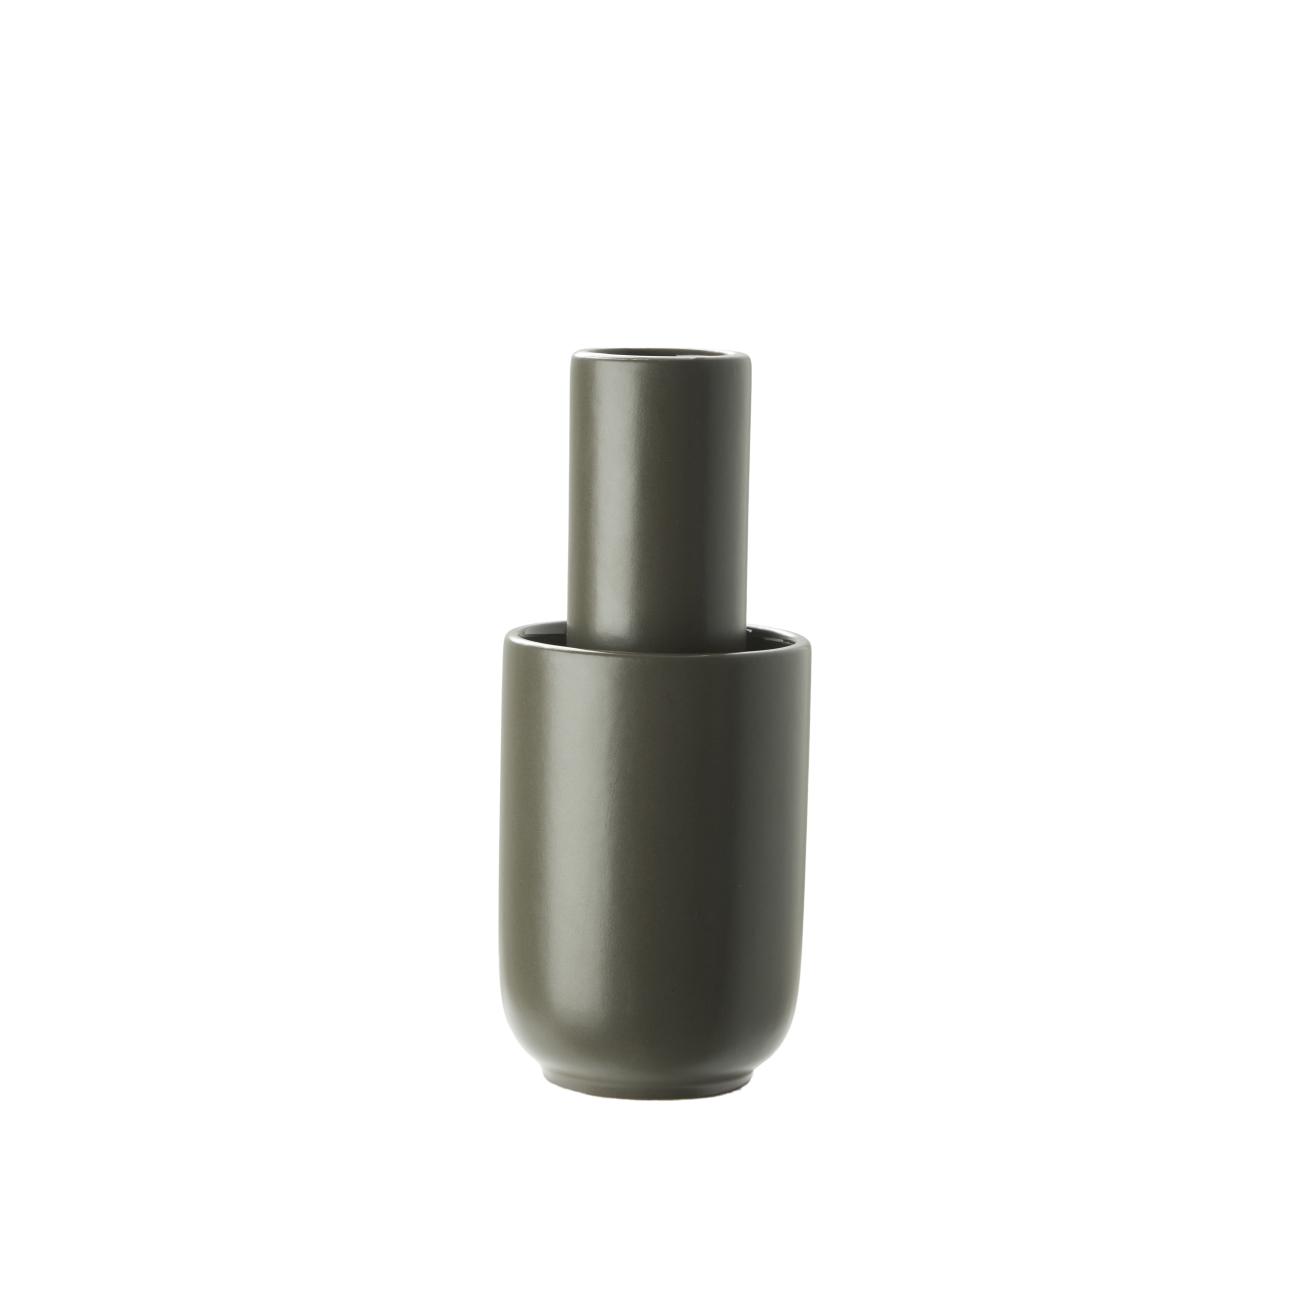 Woud Amel Vas Small Taupe